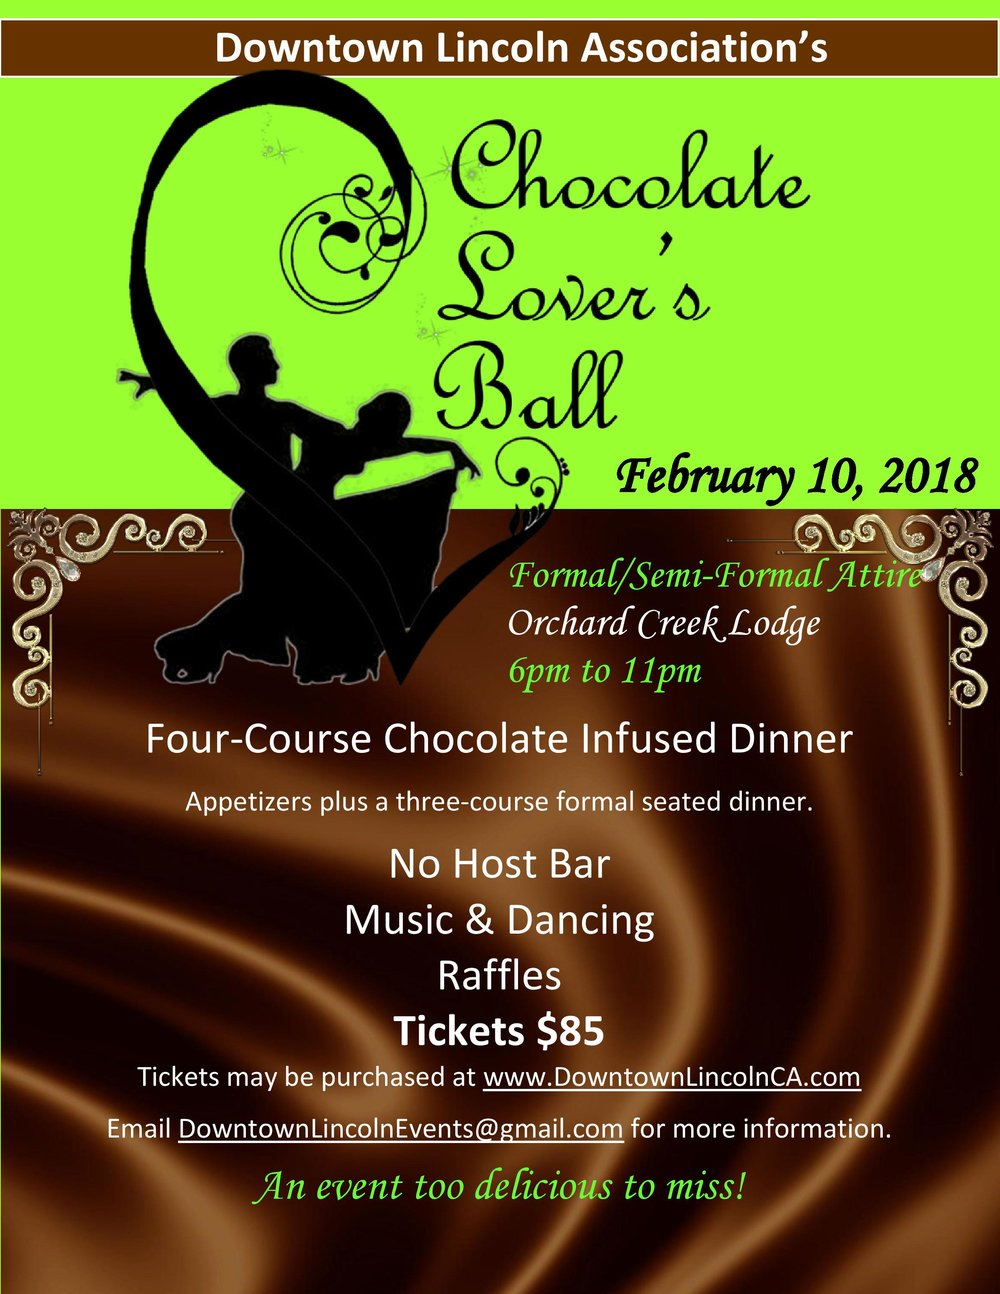 Chocolate Lover s Ball 2018 Poster-JPEG.jpg